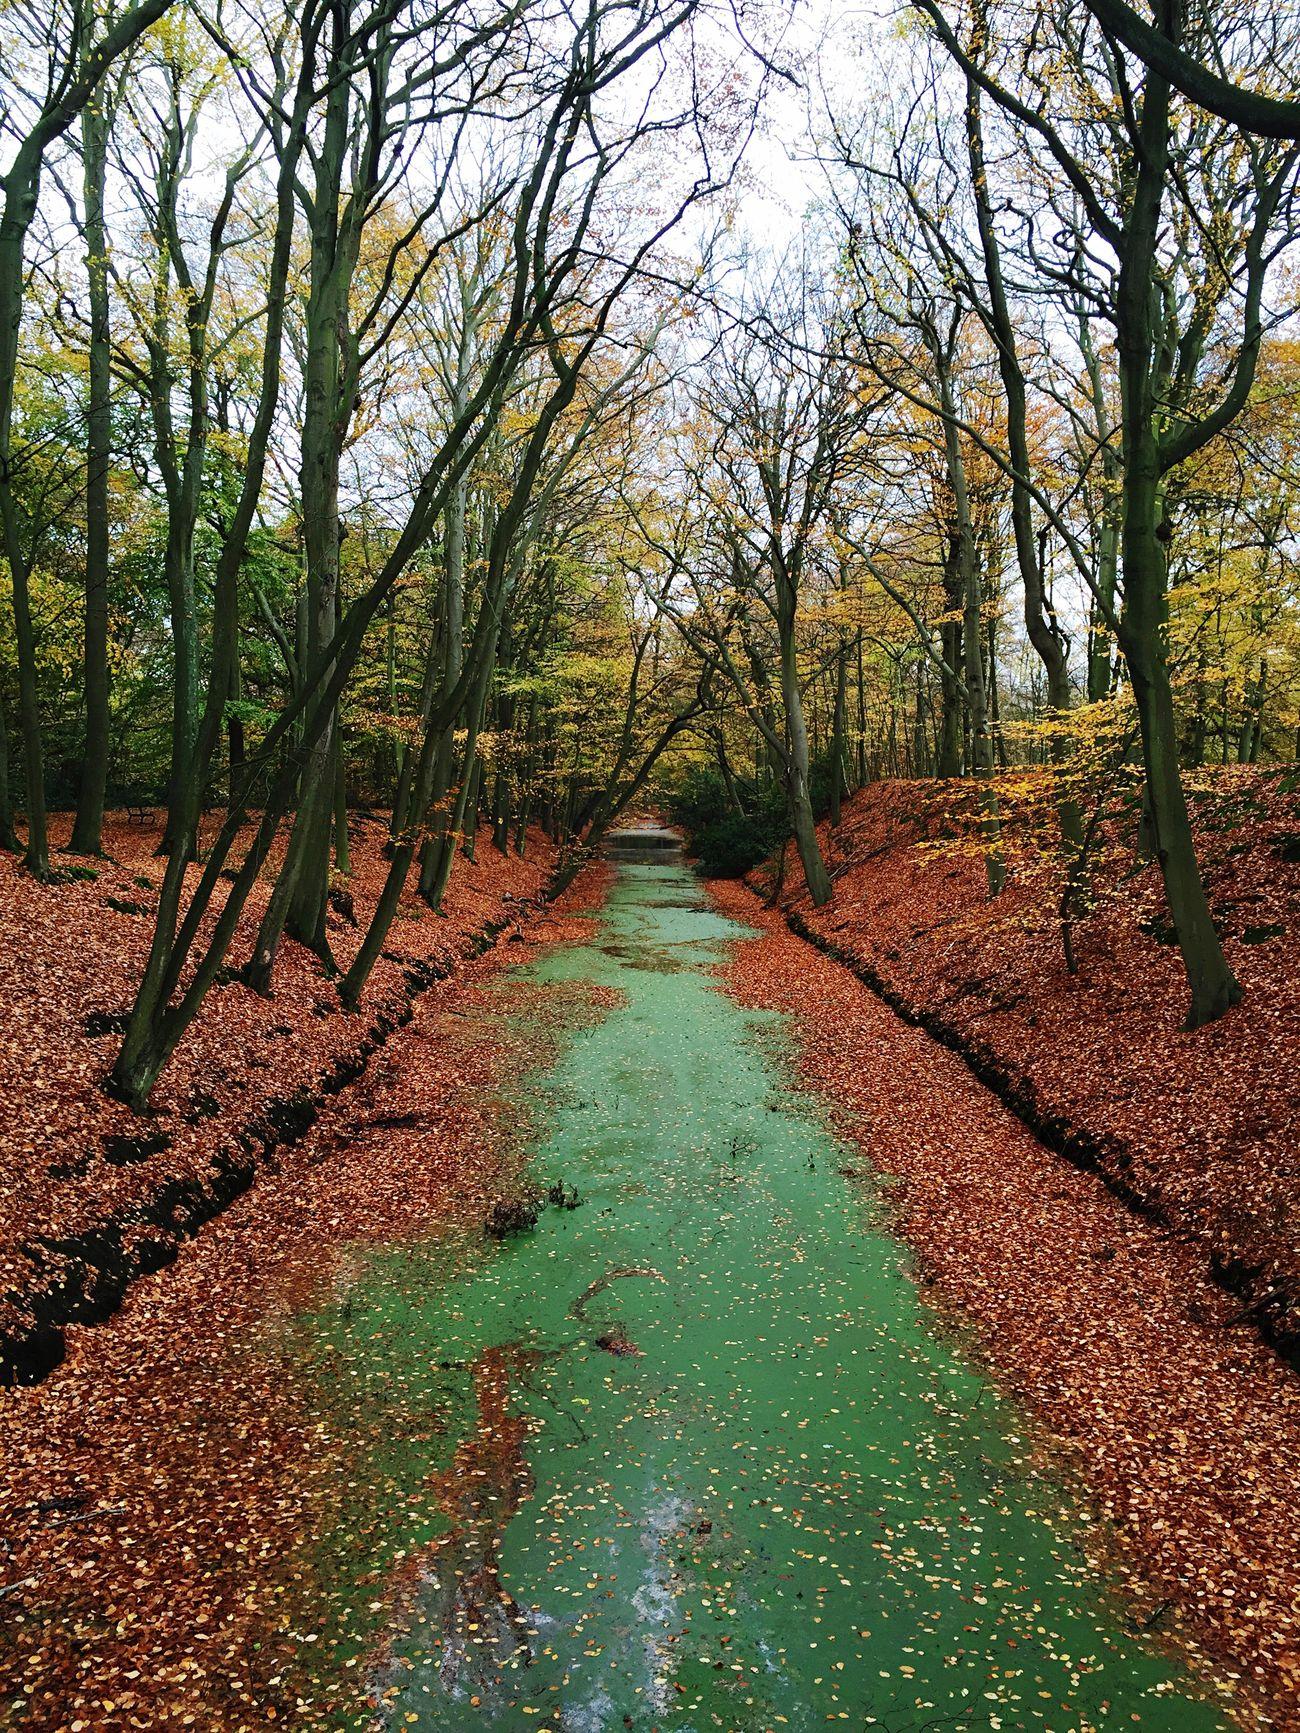 Herfst in November op Landgoed Clingendael